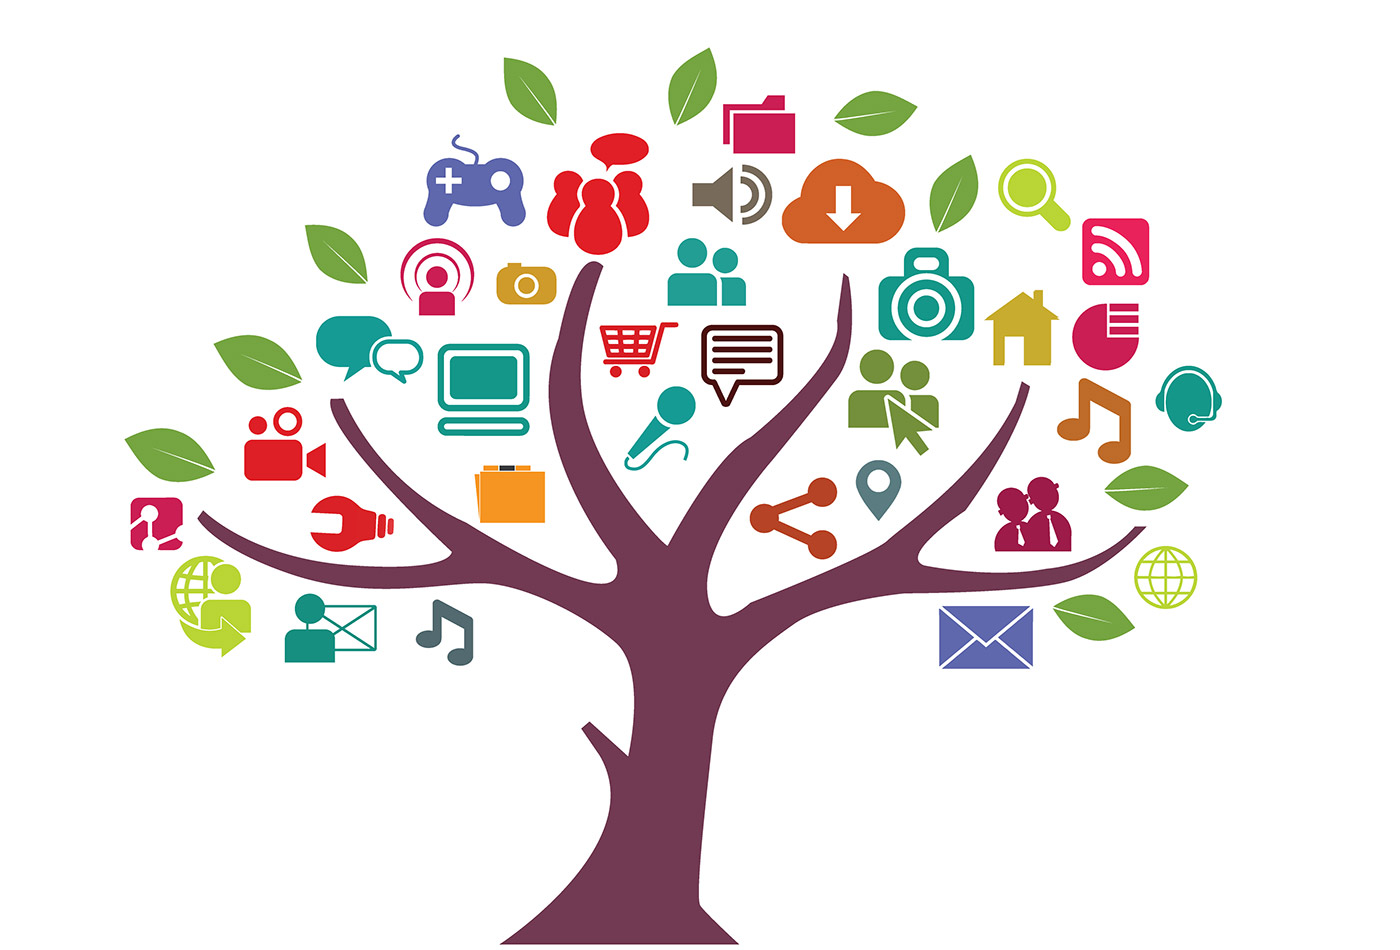 Network tree.